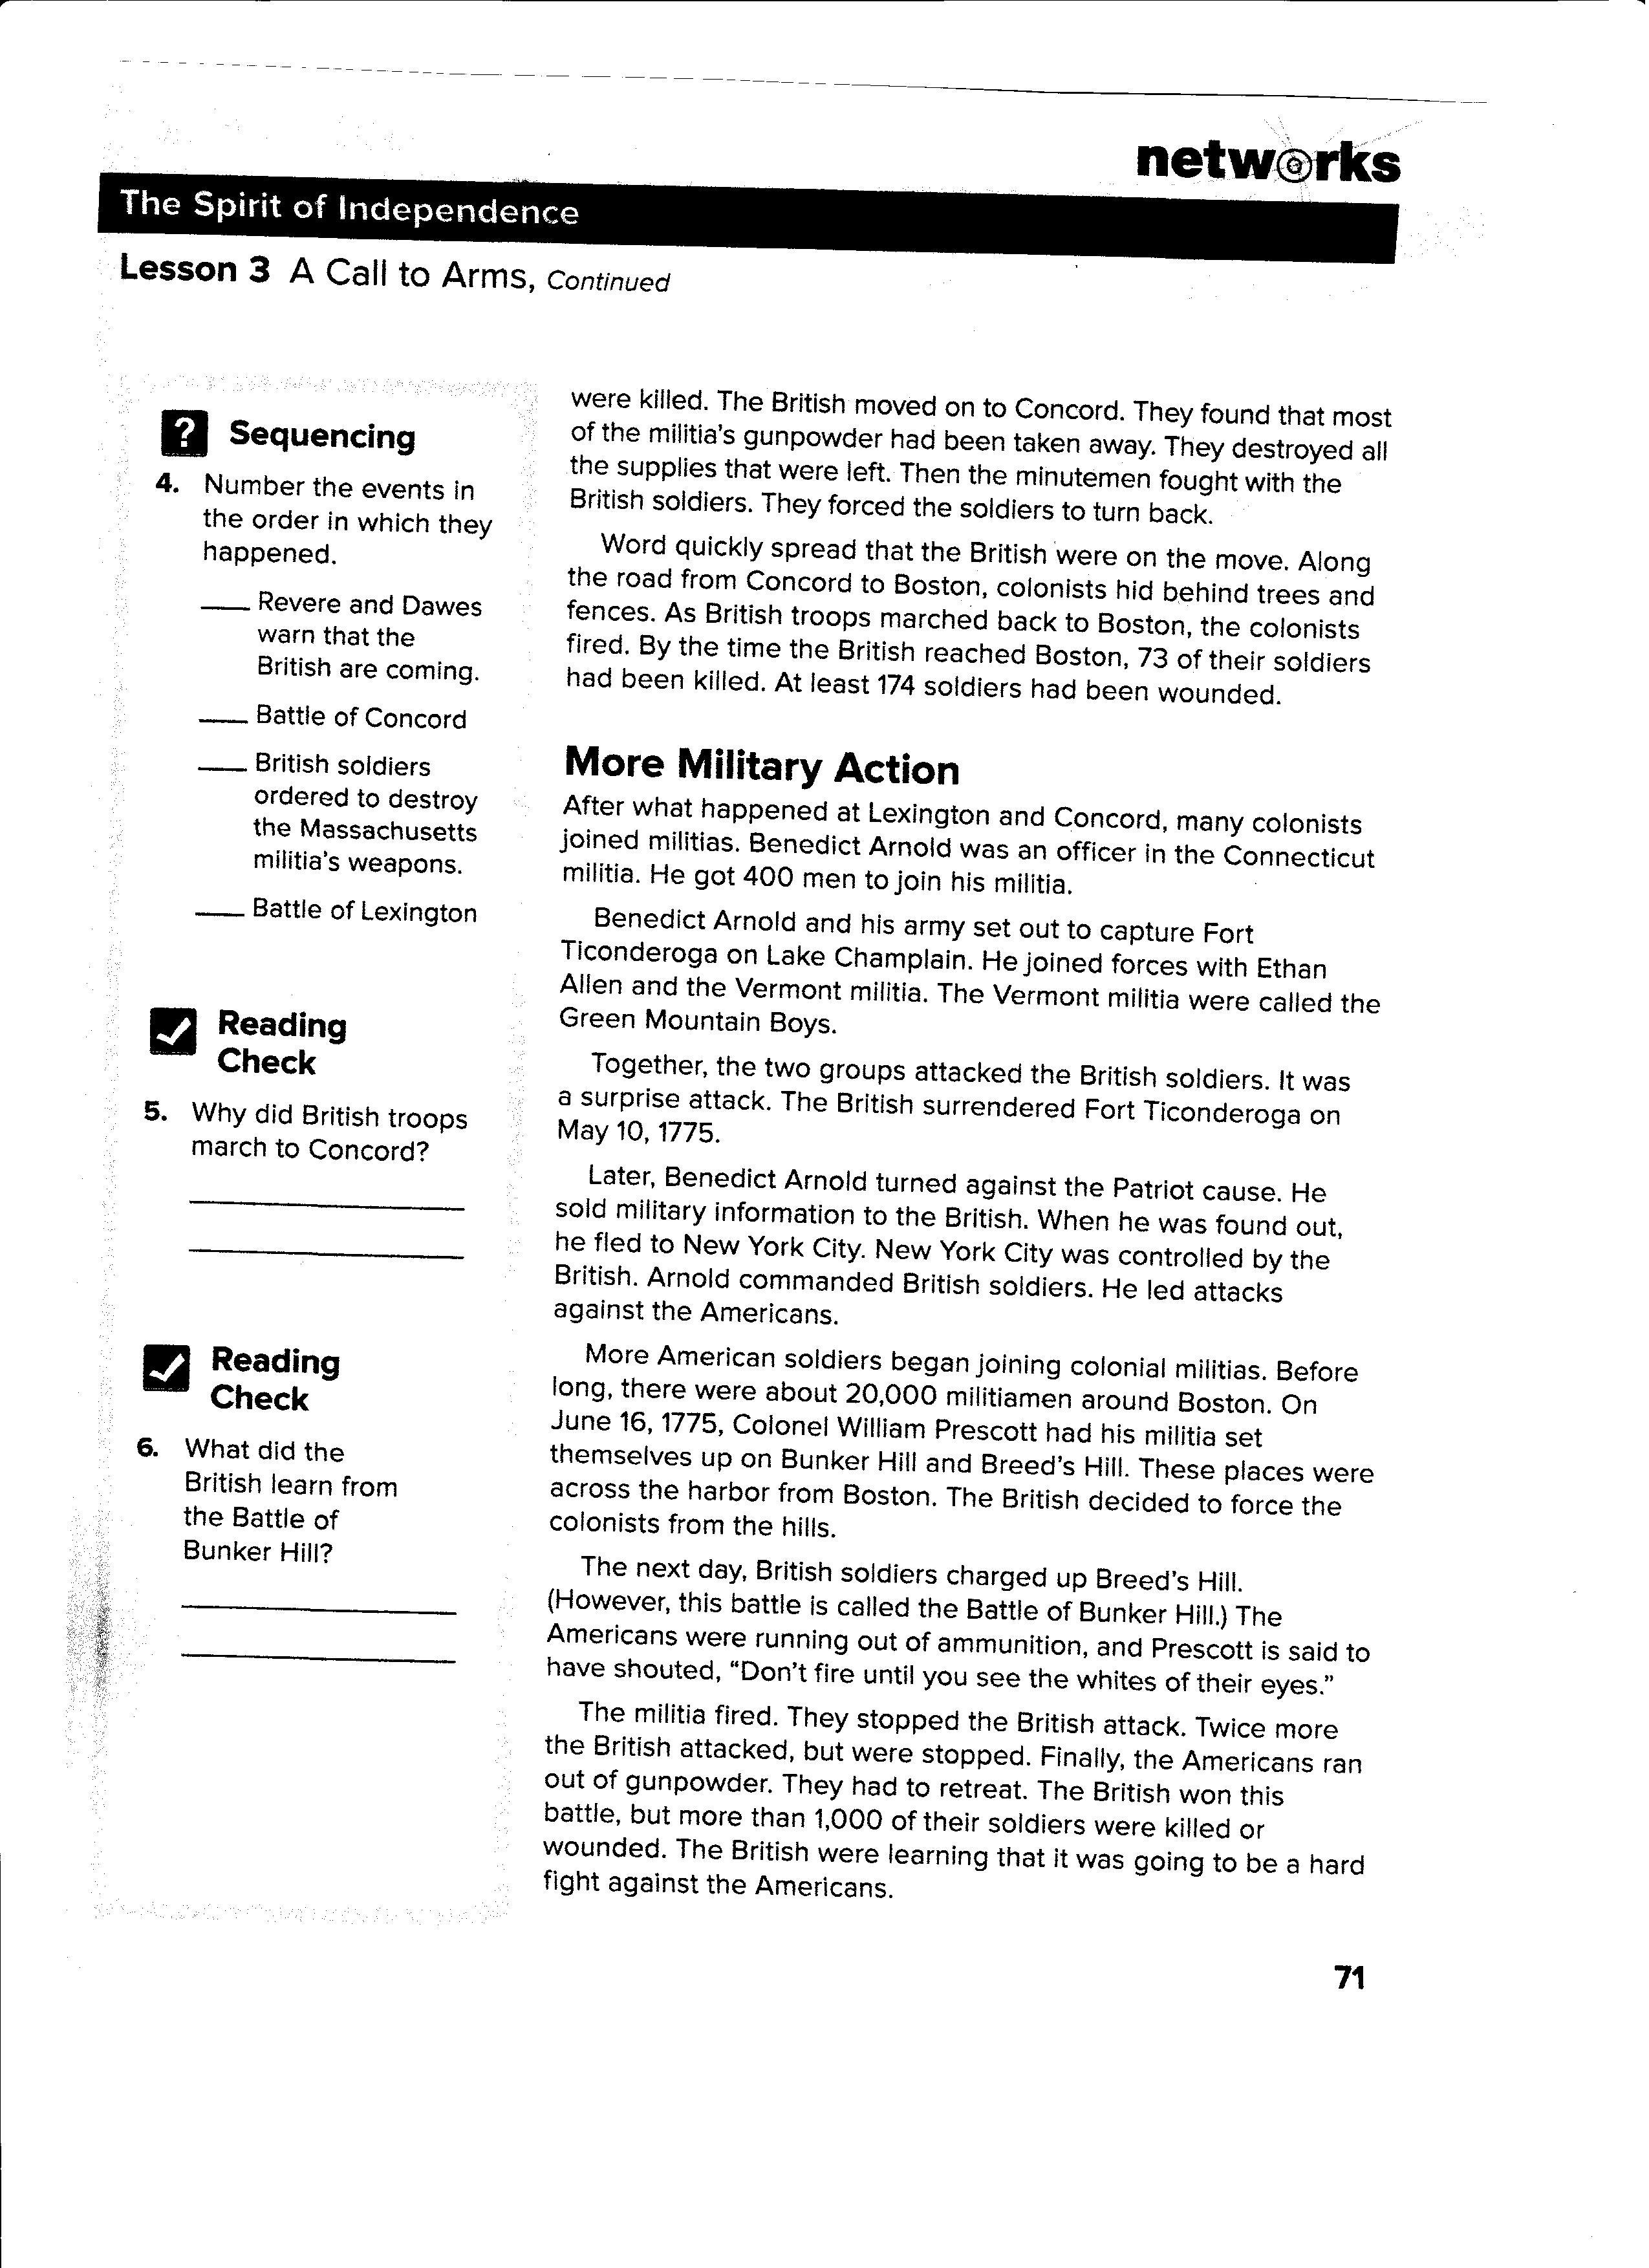 Federalist 71 summary